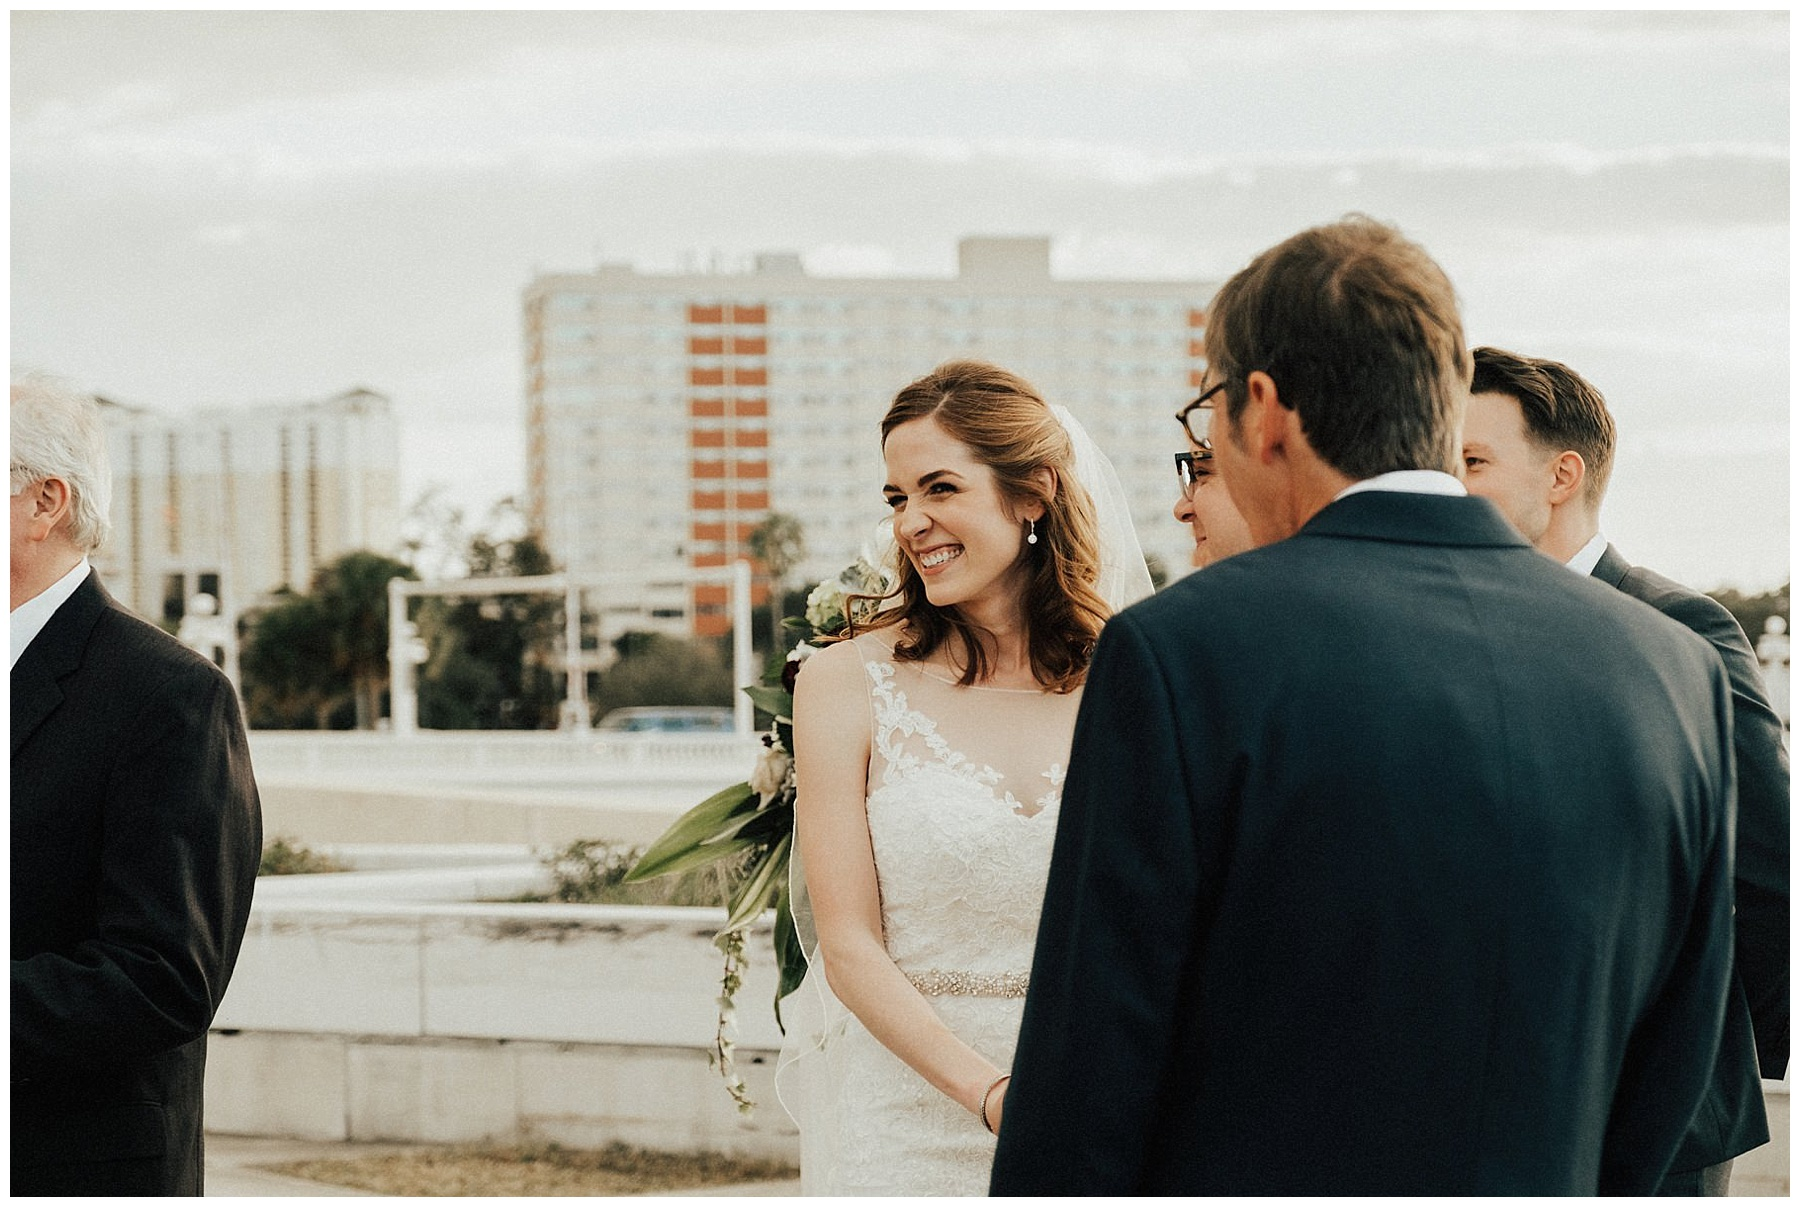 Kylie Garden Wedding Tampa Wedding Photographer-71.jpg